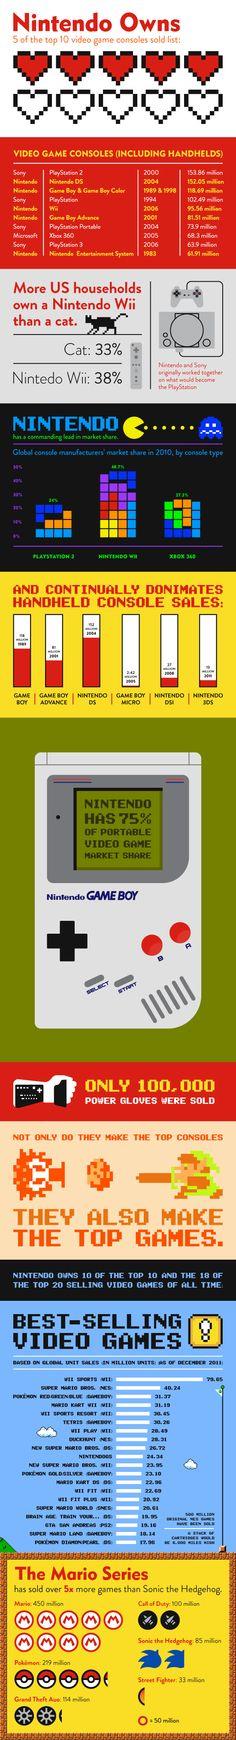 Nintendo MBA - Trevor Basset